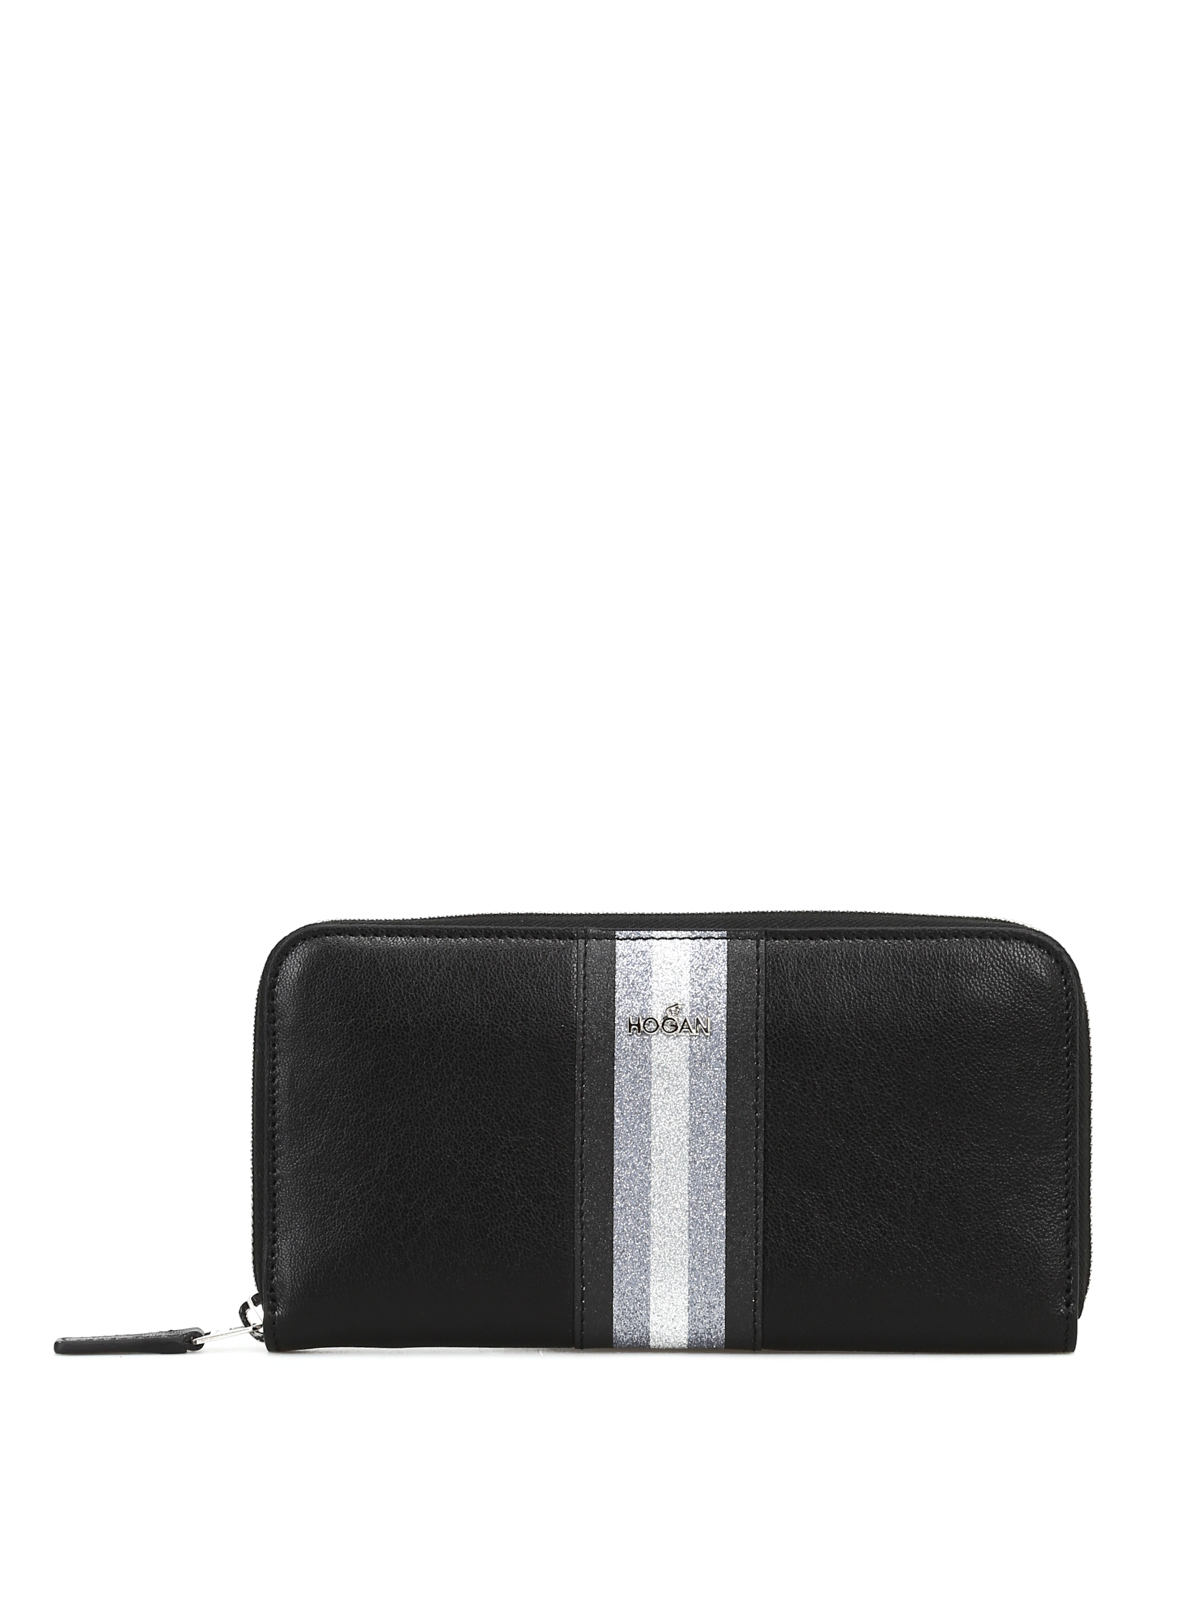 wholesale dealer 01c3d aad0b Hogan - Portafoglio zip-around con banda glitter ...